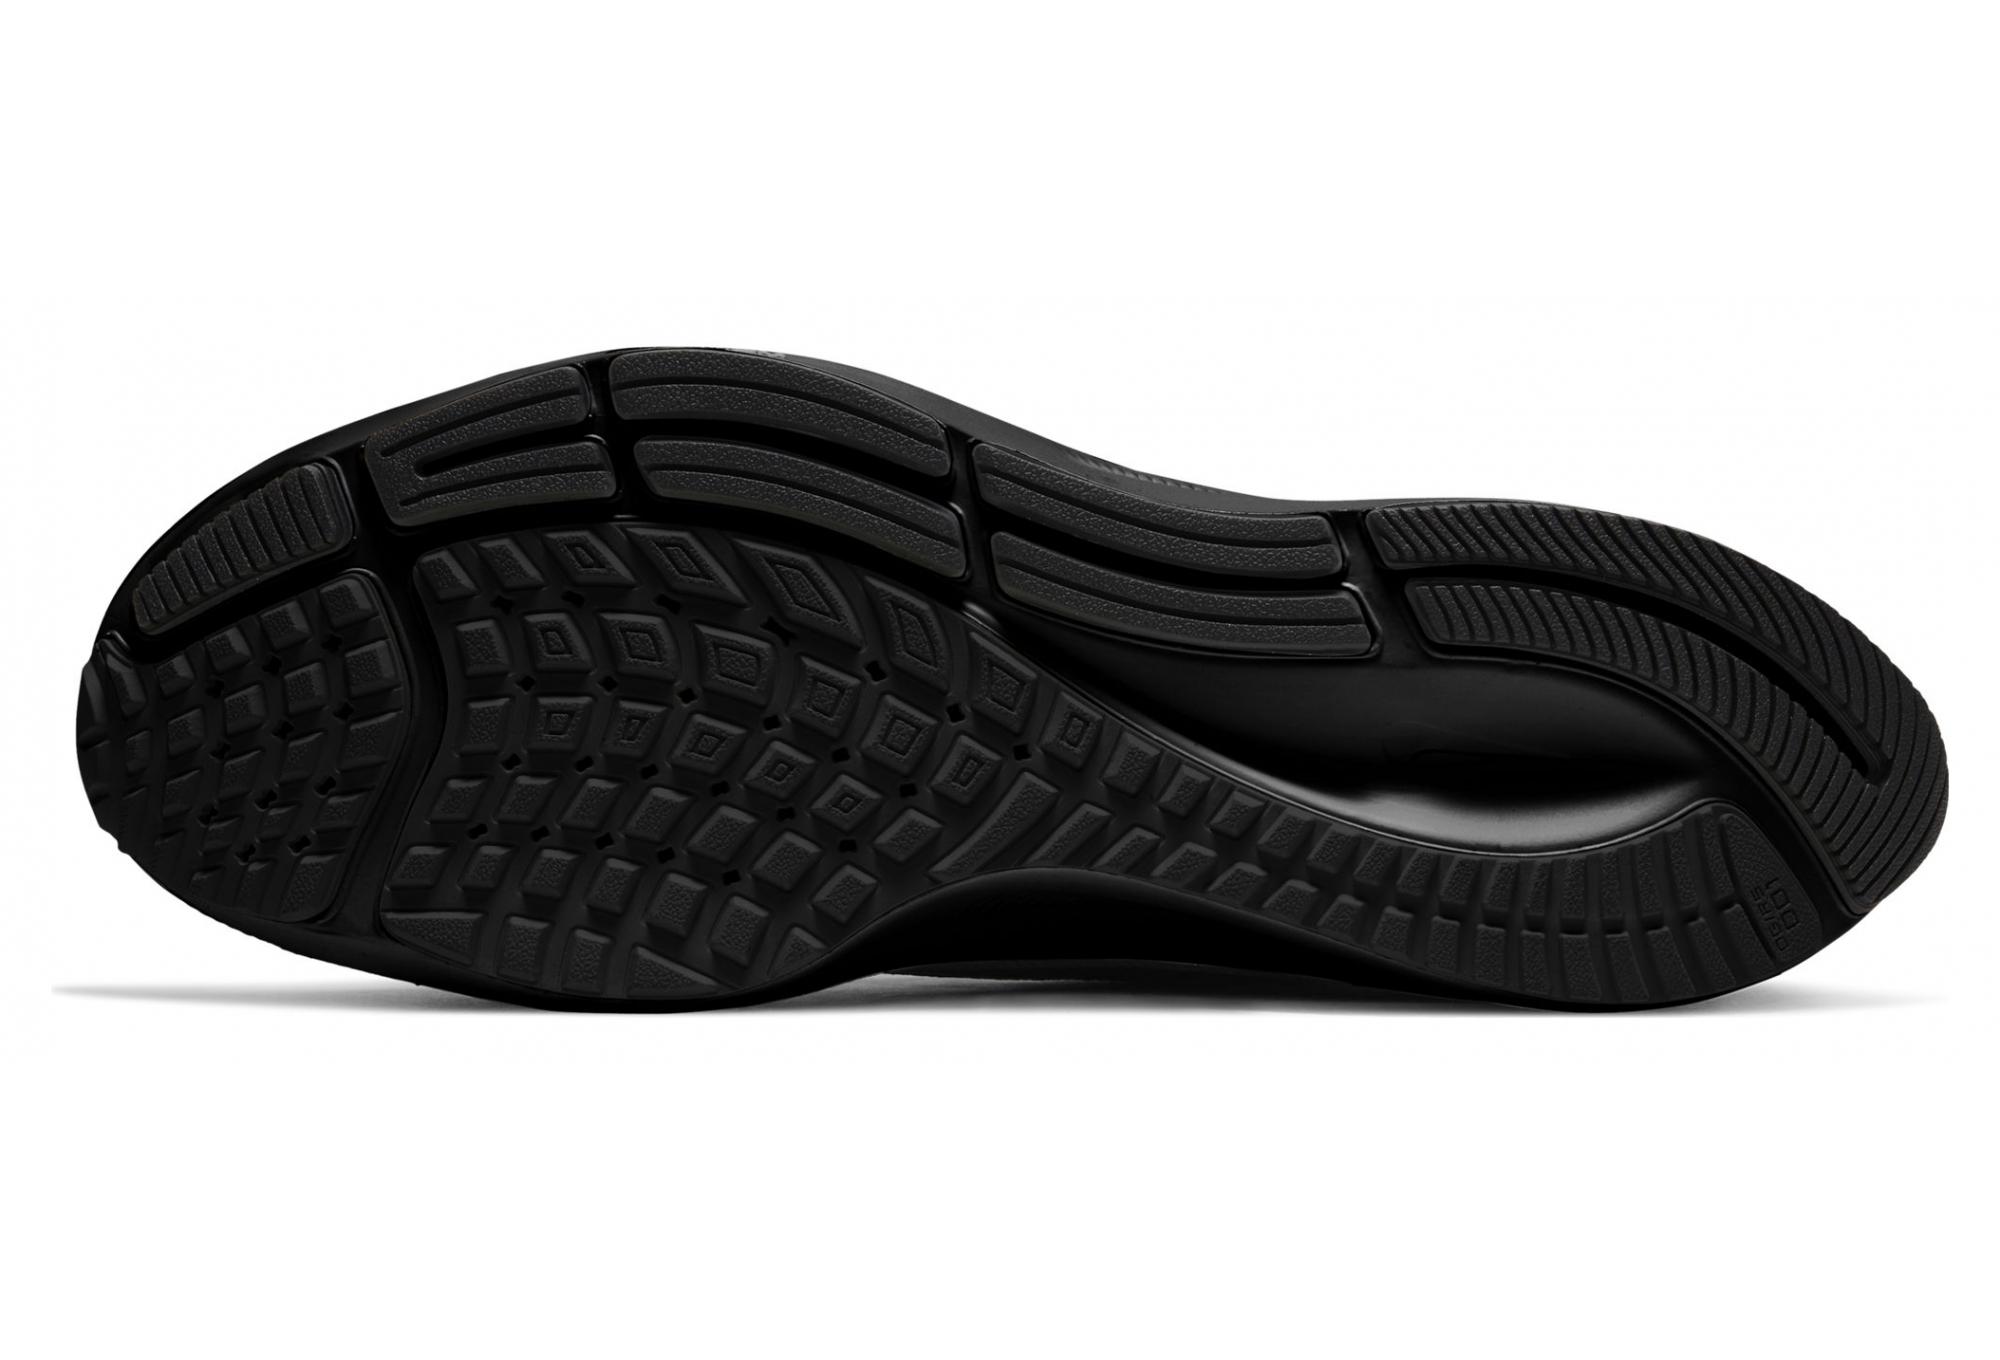 Pair of Running Shoes Nike Air Zoom Pegasus 37 Black